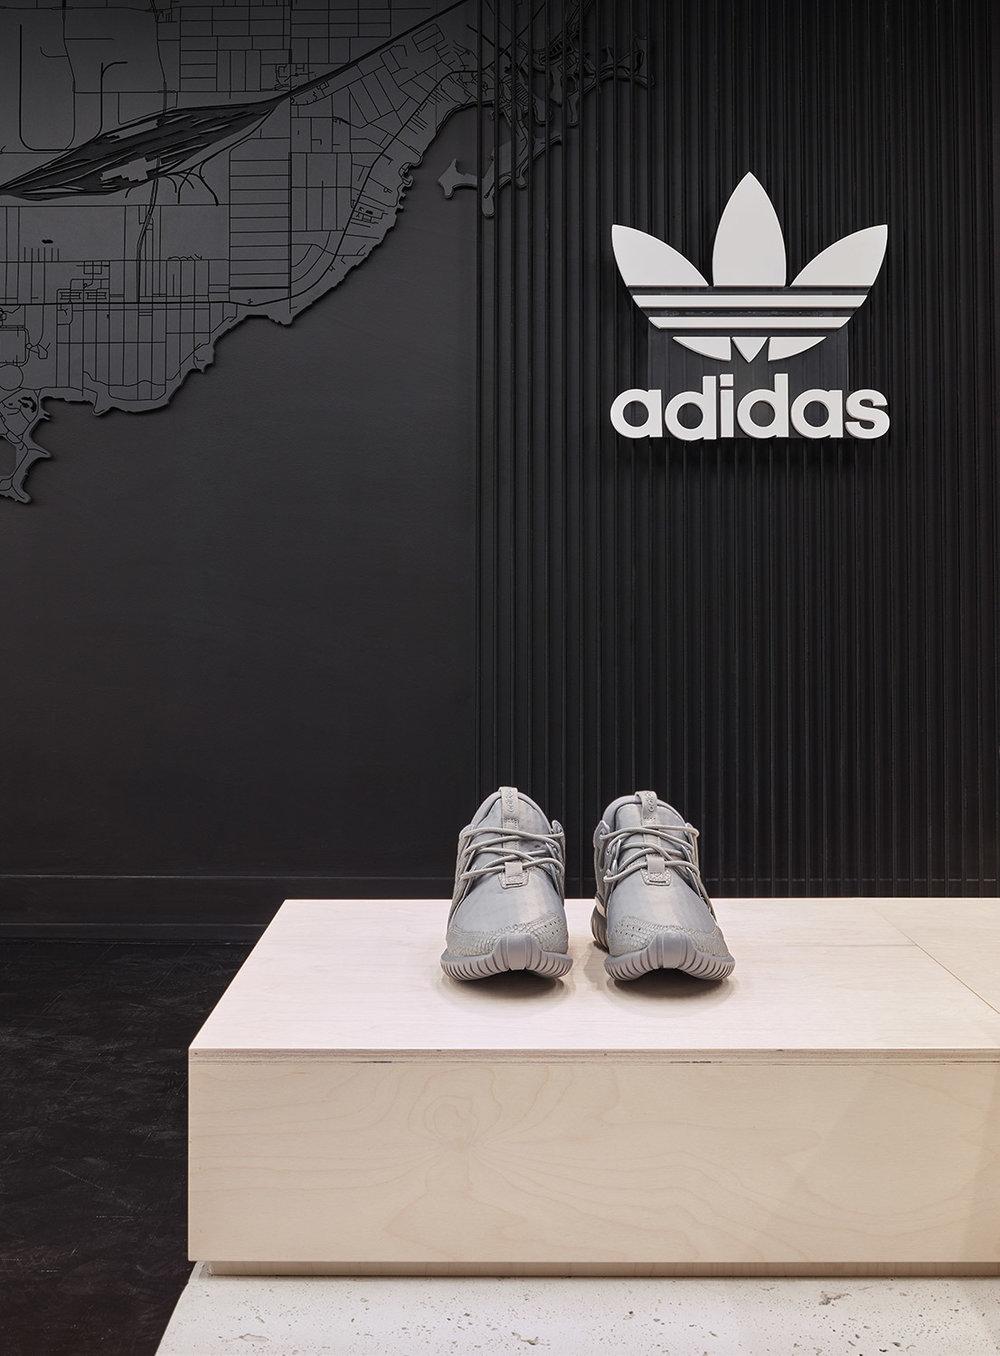 Adidas_Exclucity-07.jpg